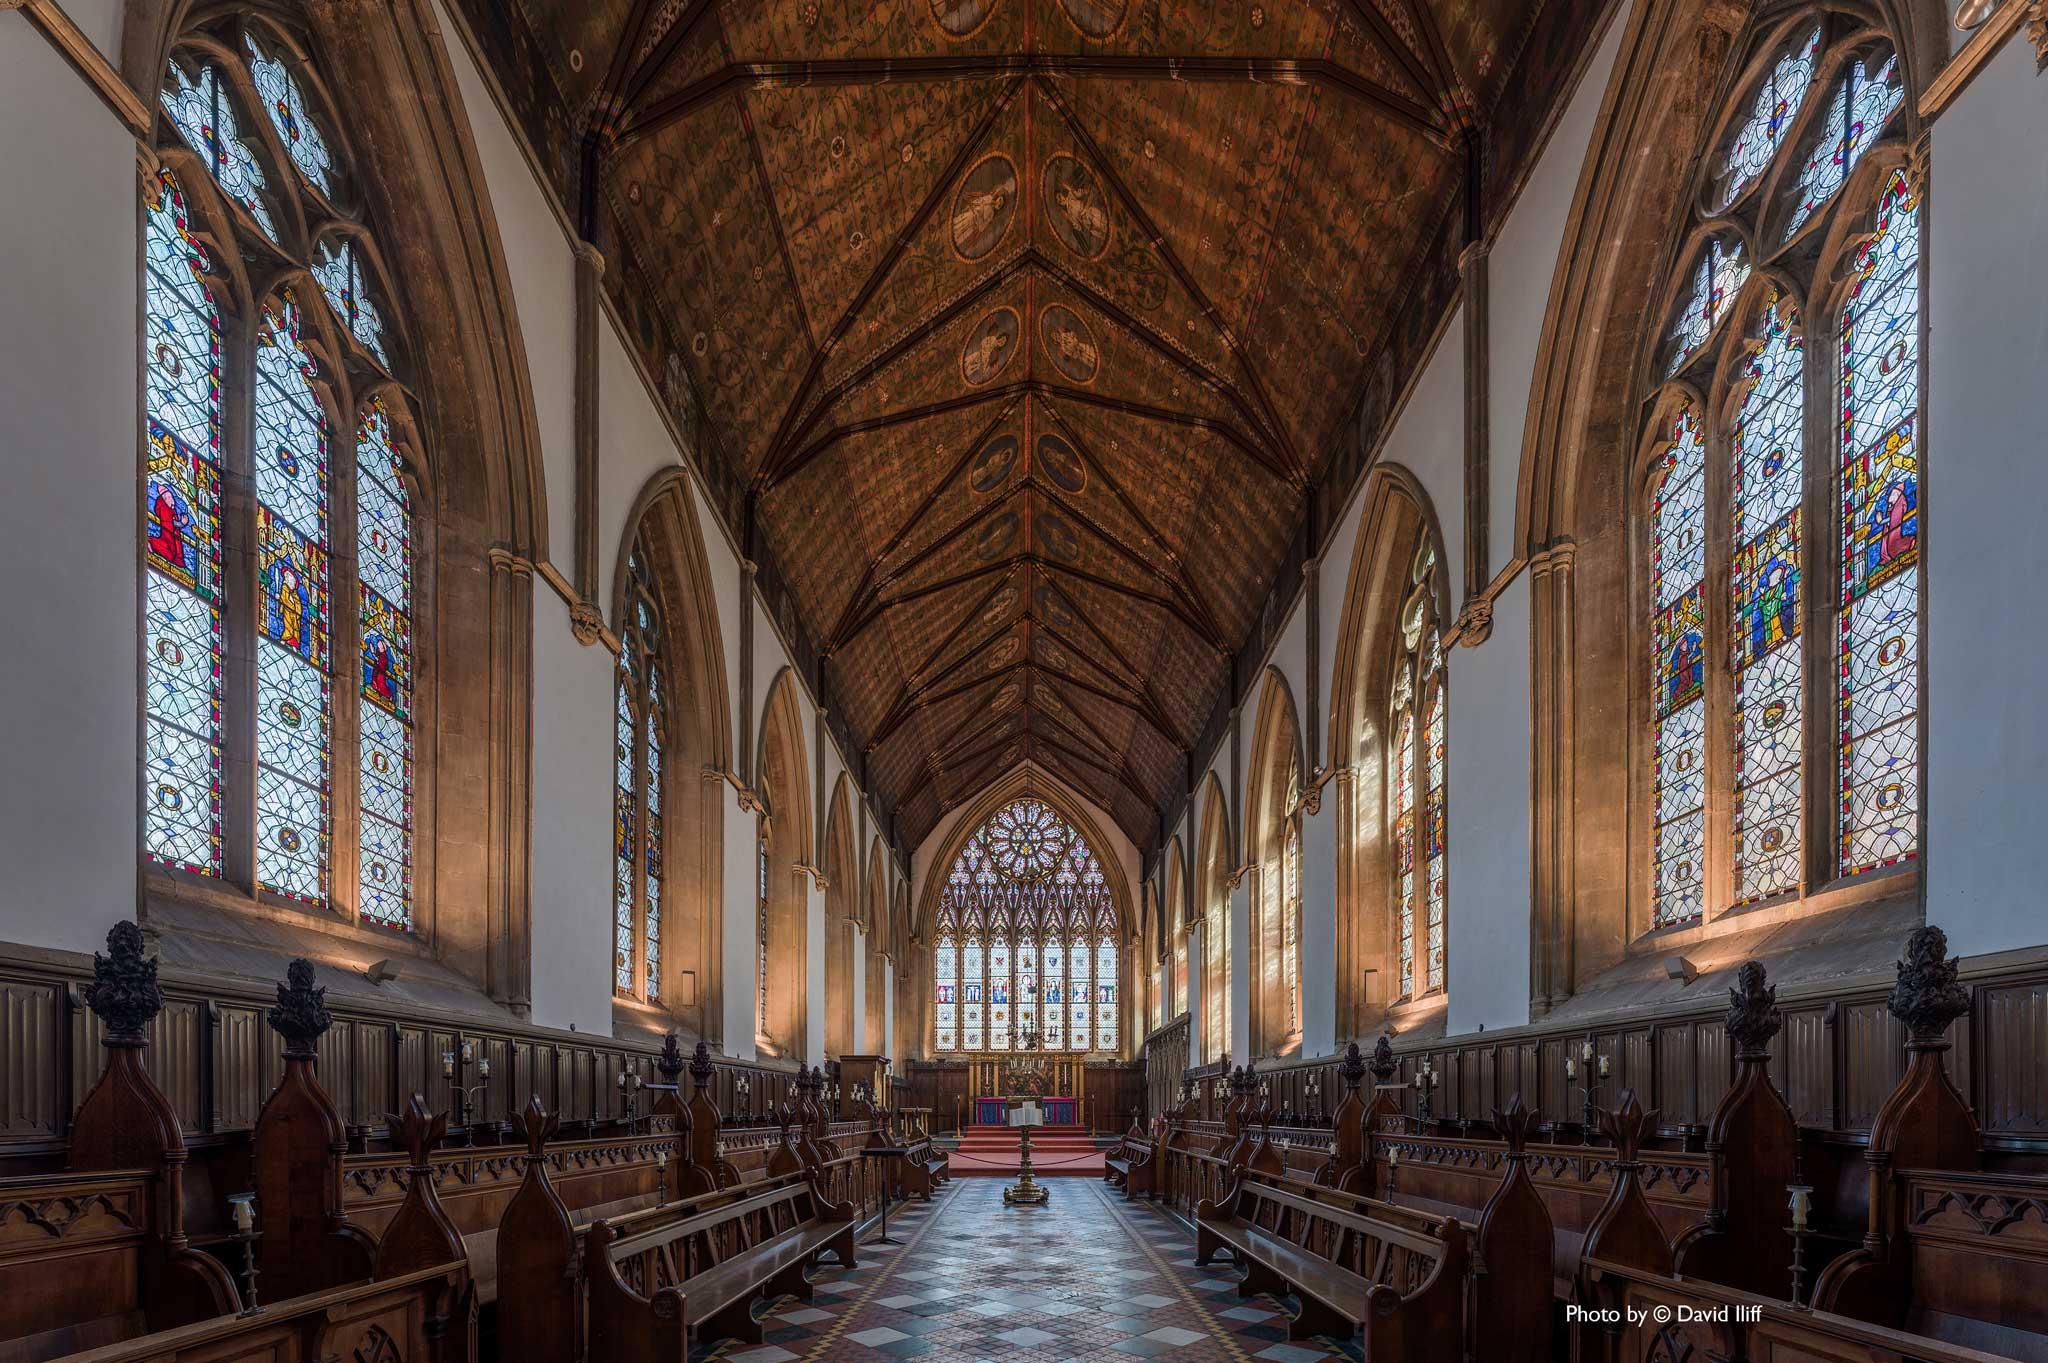 merton-college-chapel-interior-by-david-iliff